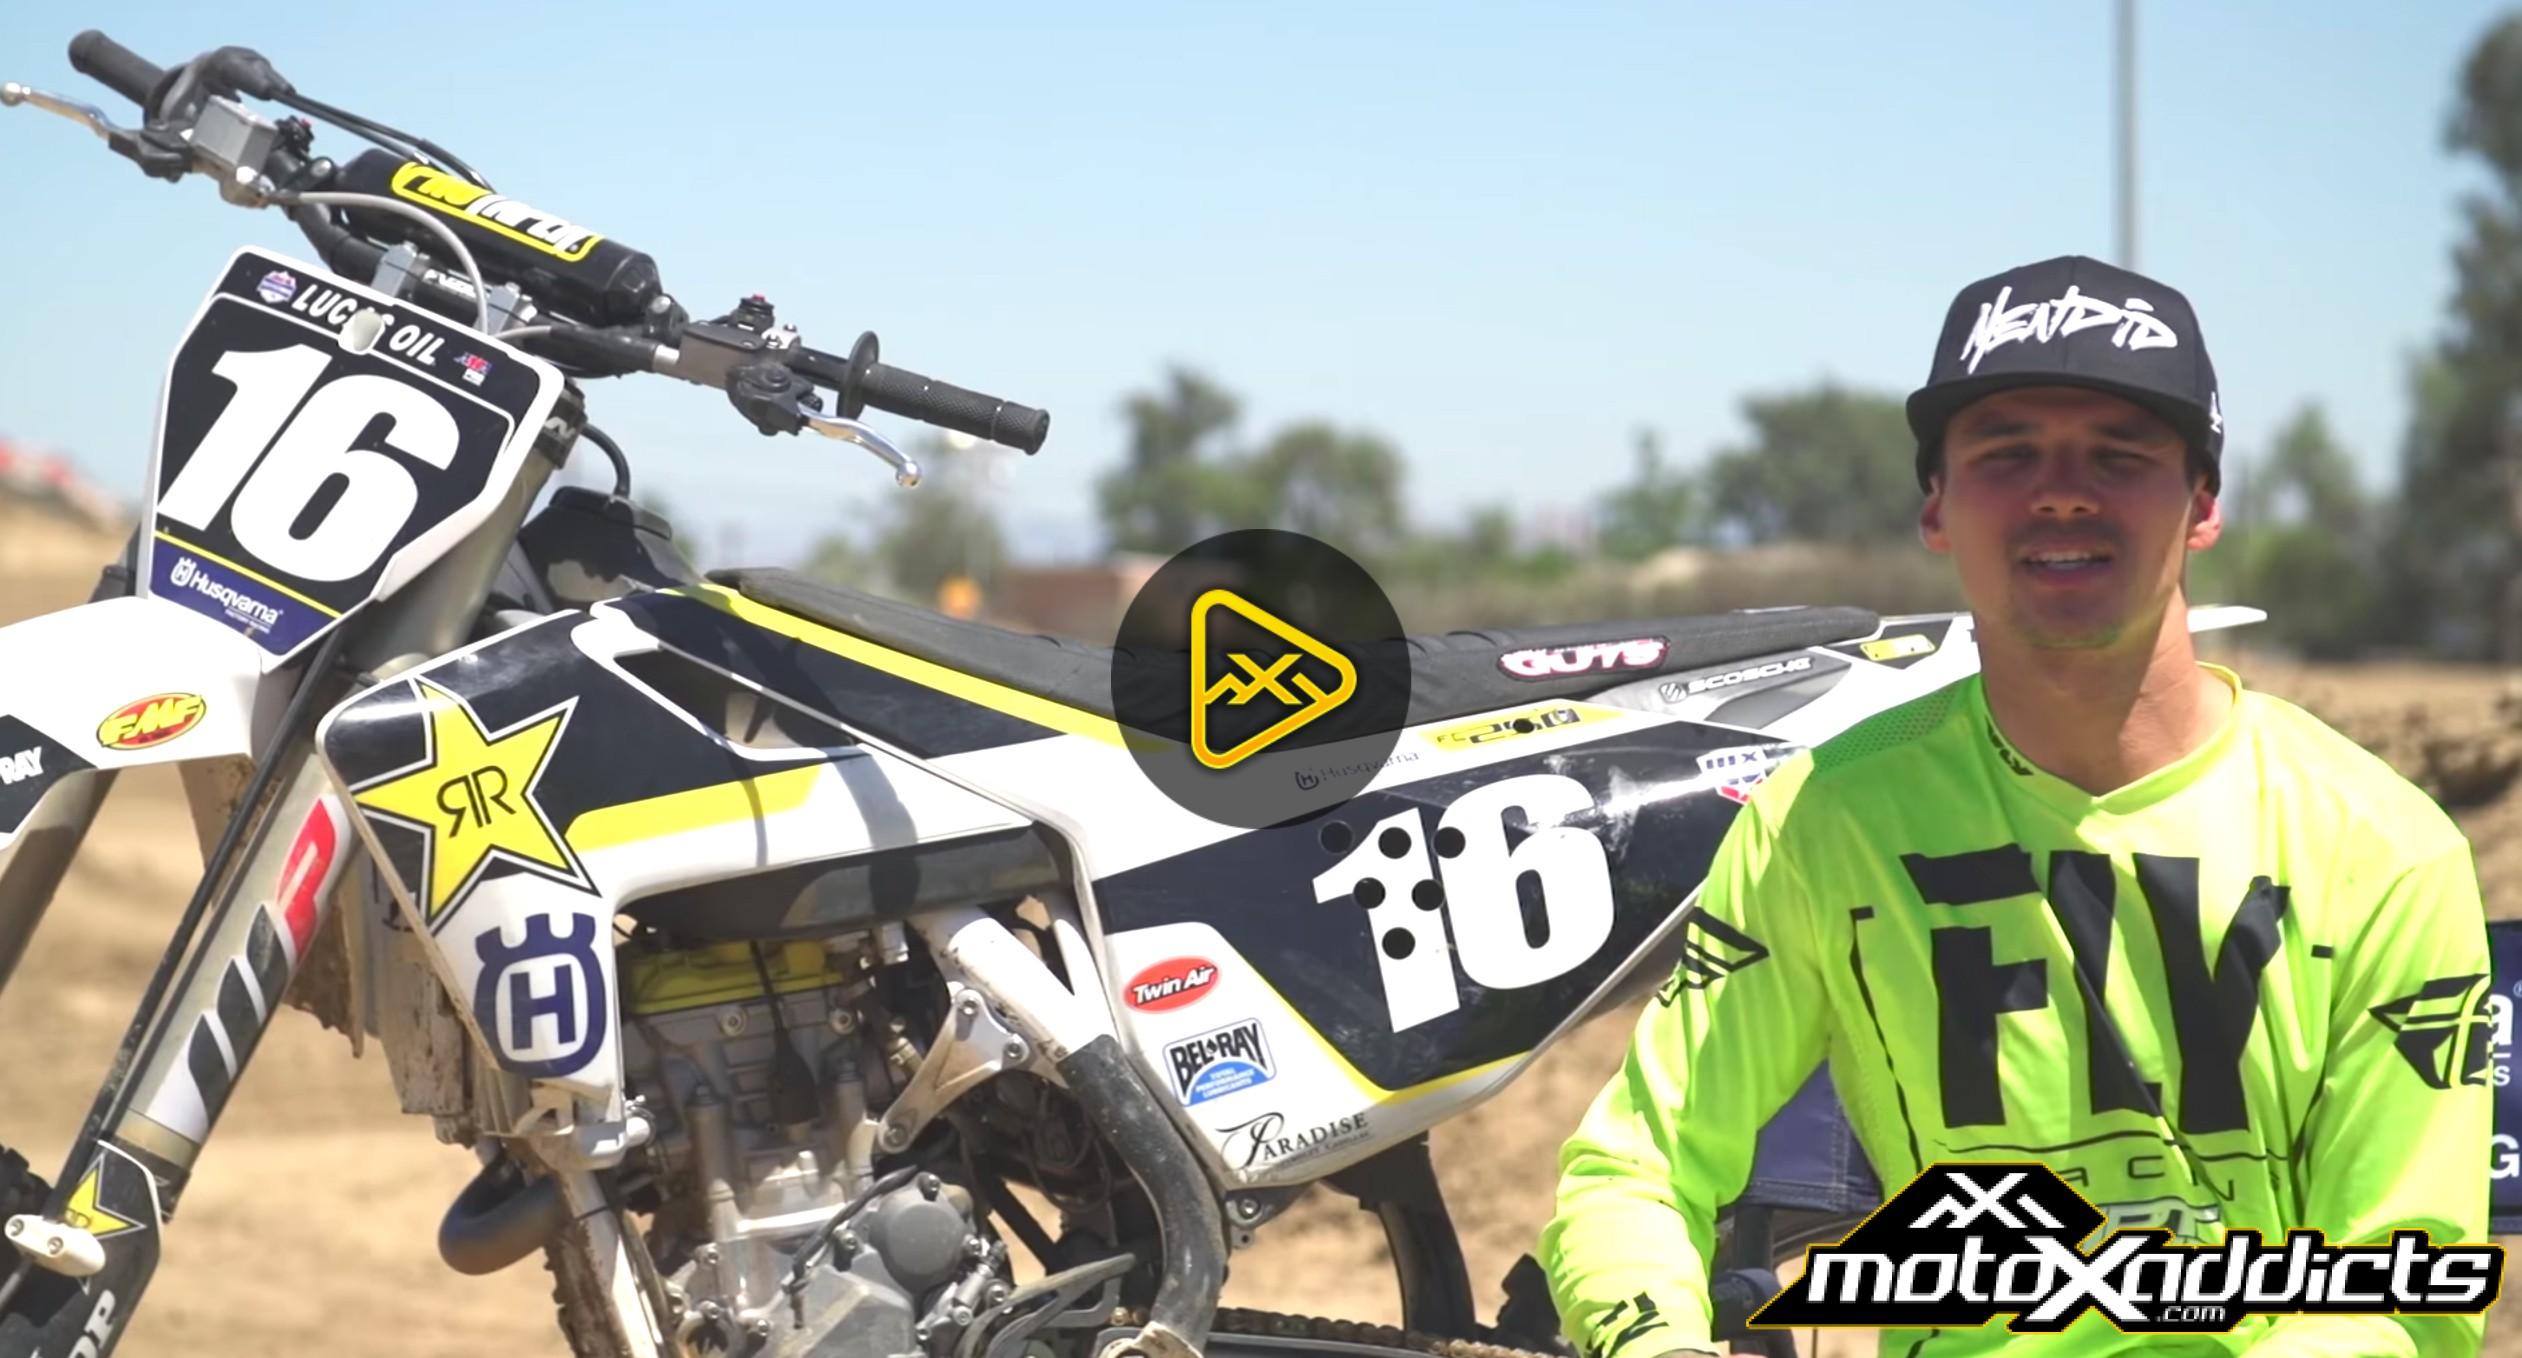 Ride Zach Osborne's SX Winning Husqvarna FC 250 Factory Bike